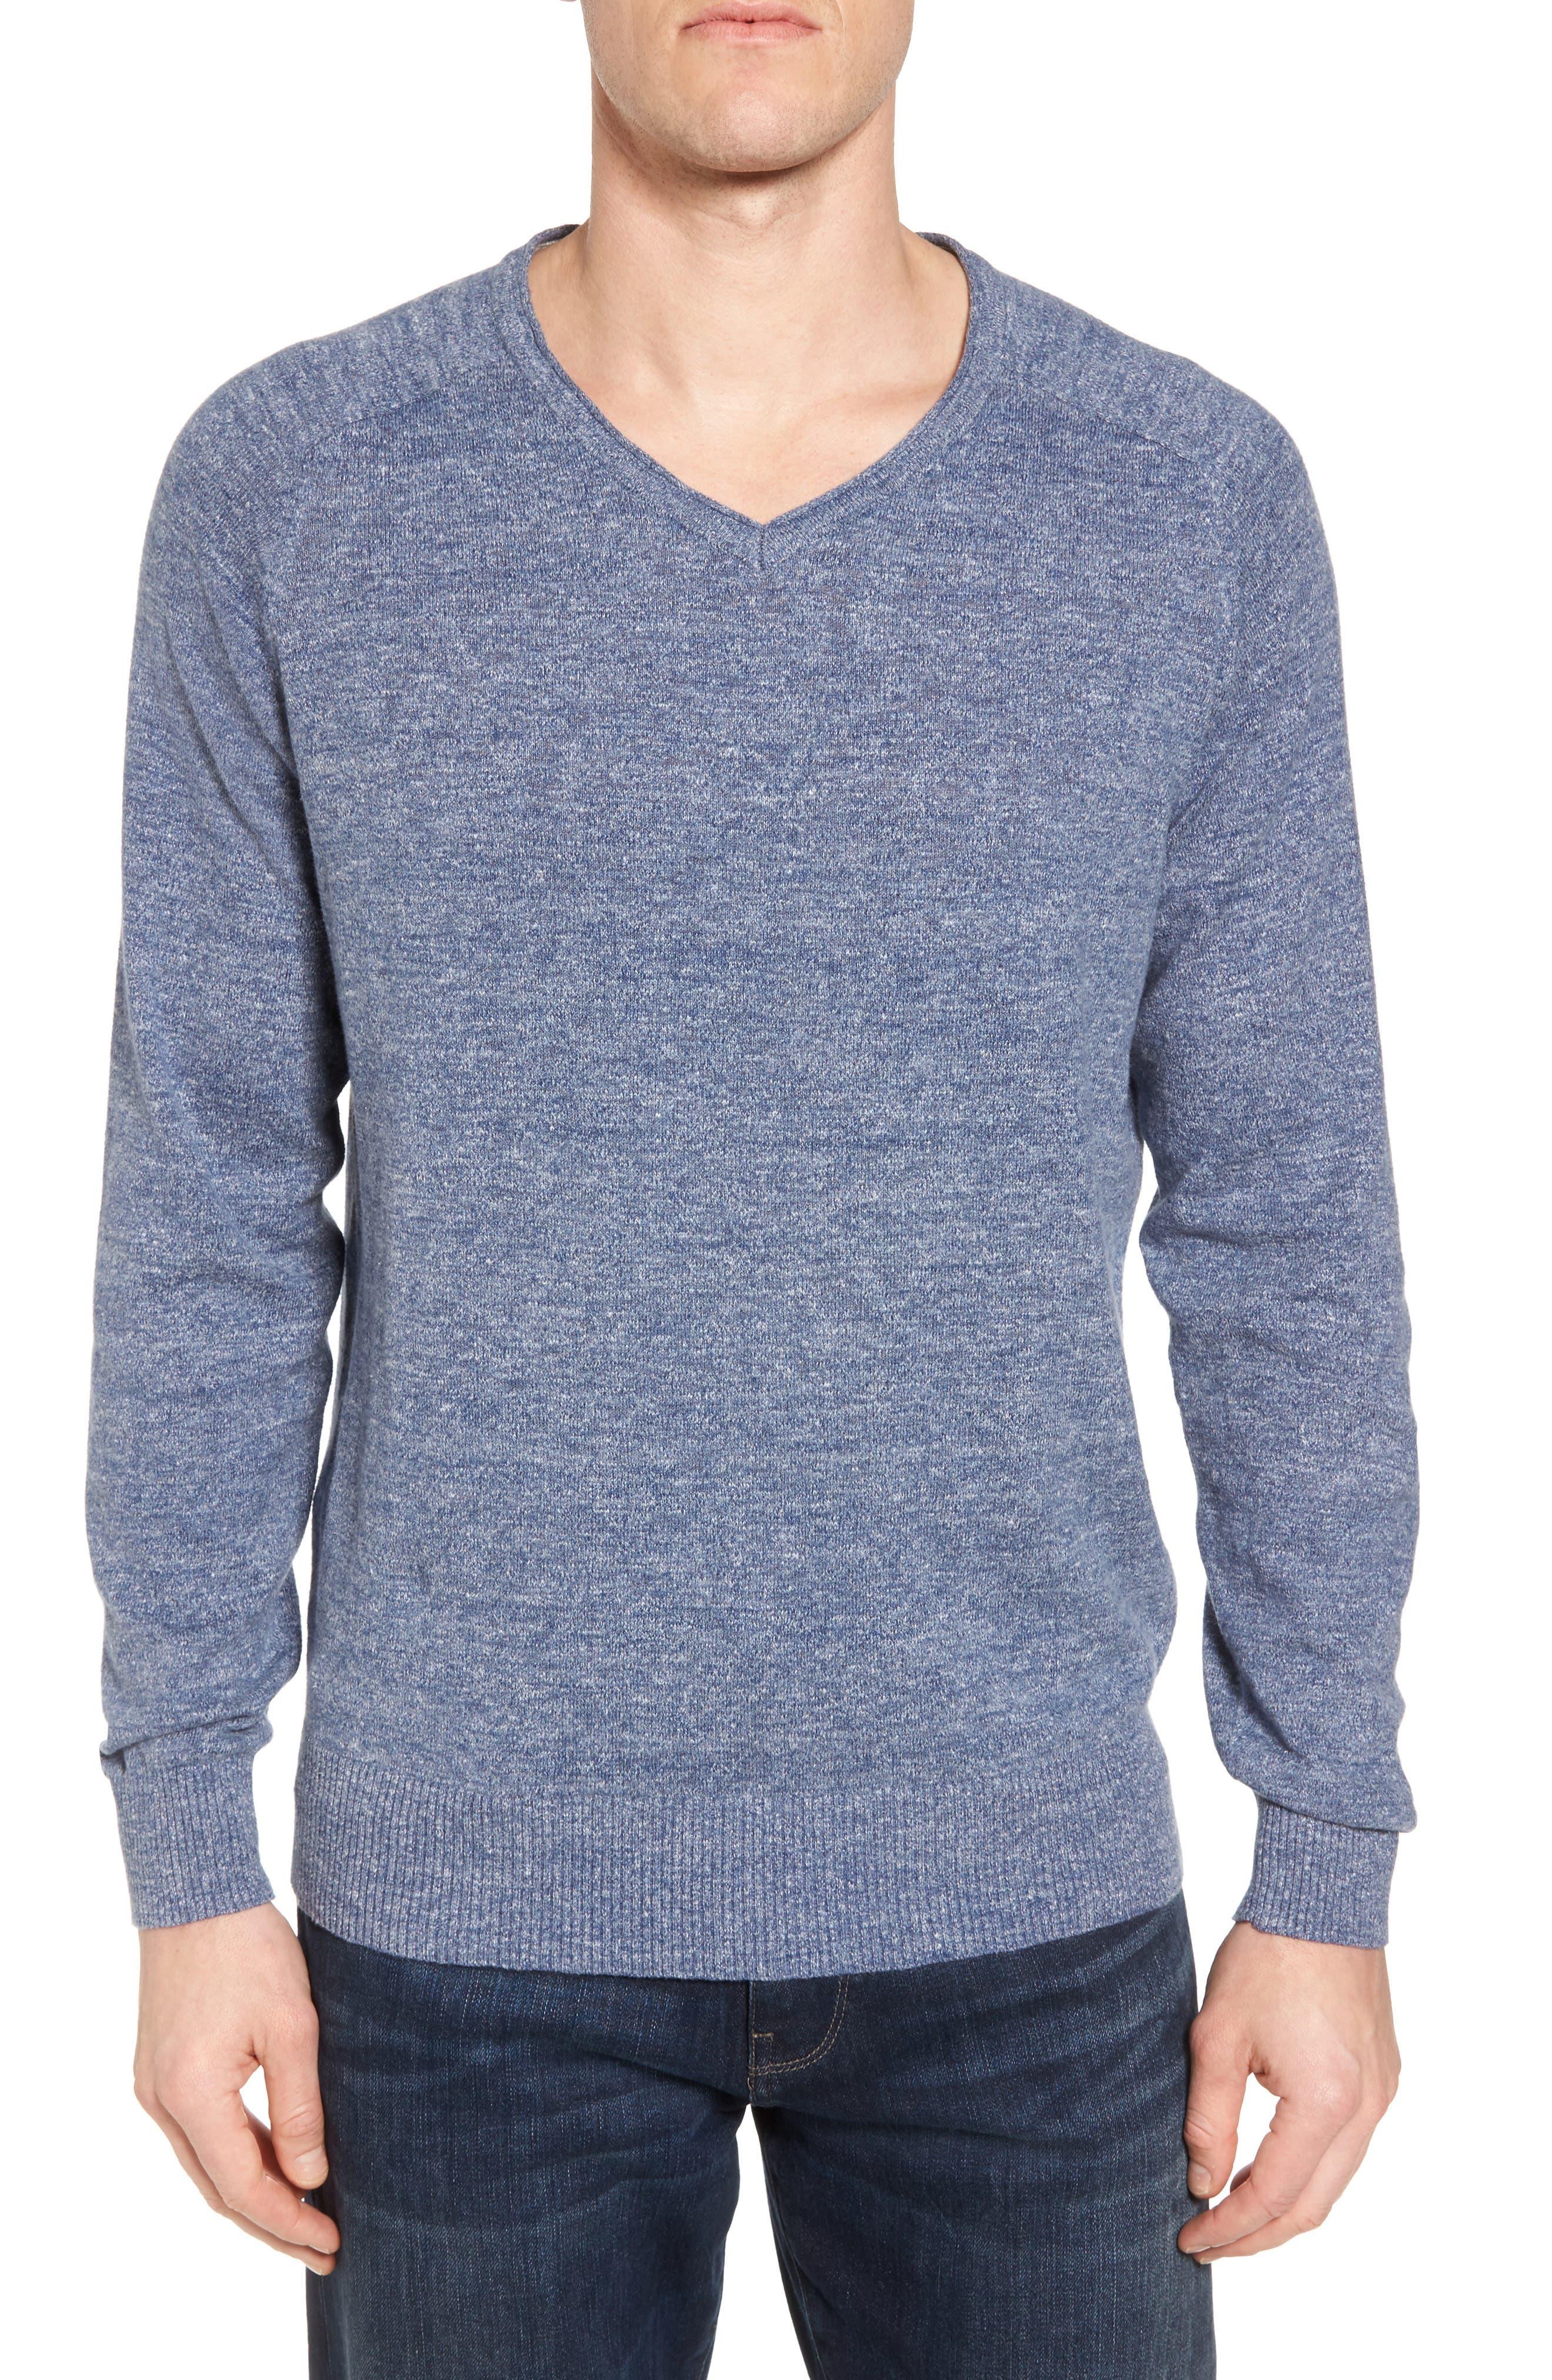 Arbors Cotton V-Neck Sweater,                             Main thumbnail 1, color,                             Riviera